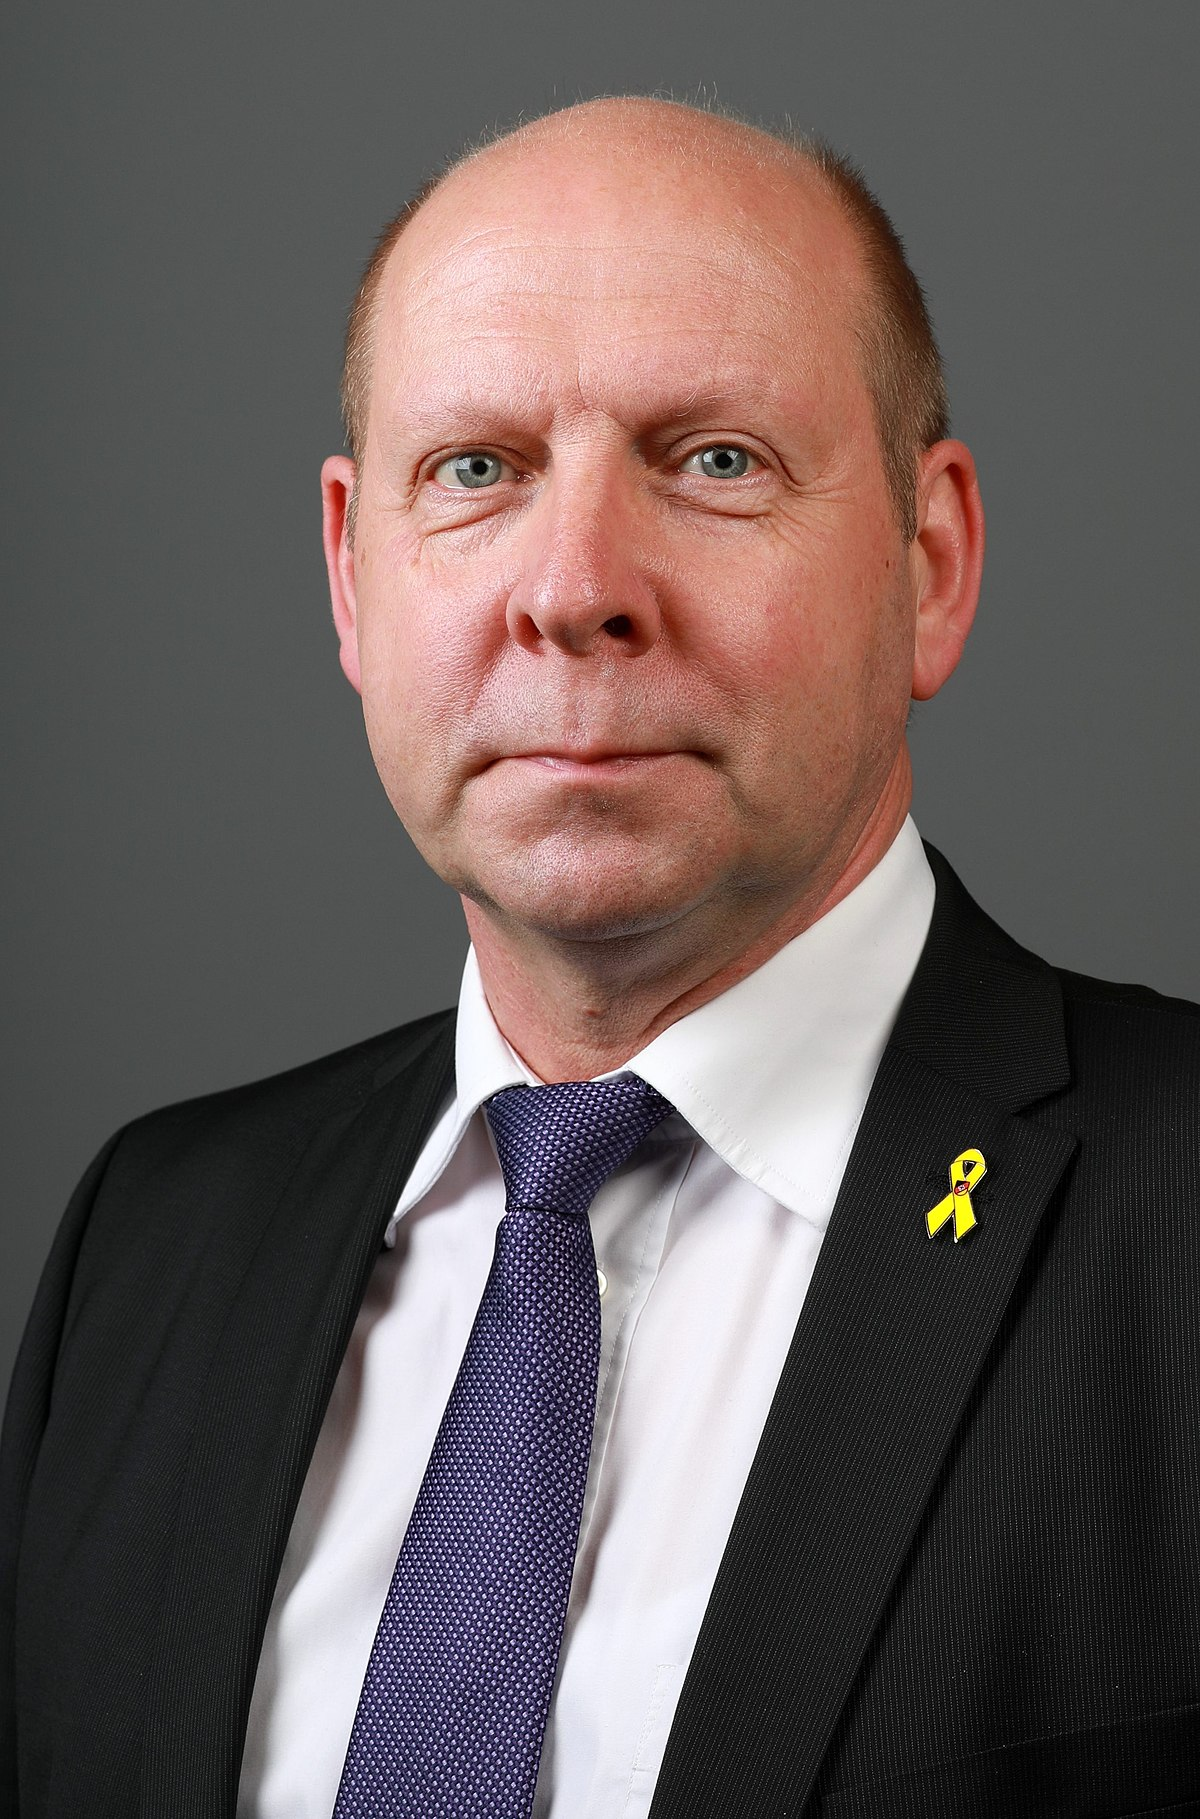 Frank Scheermesser